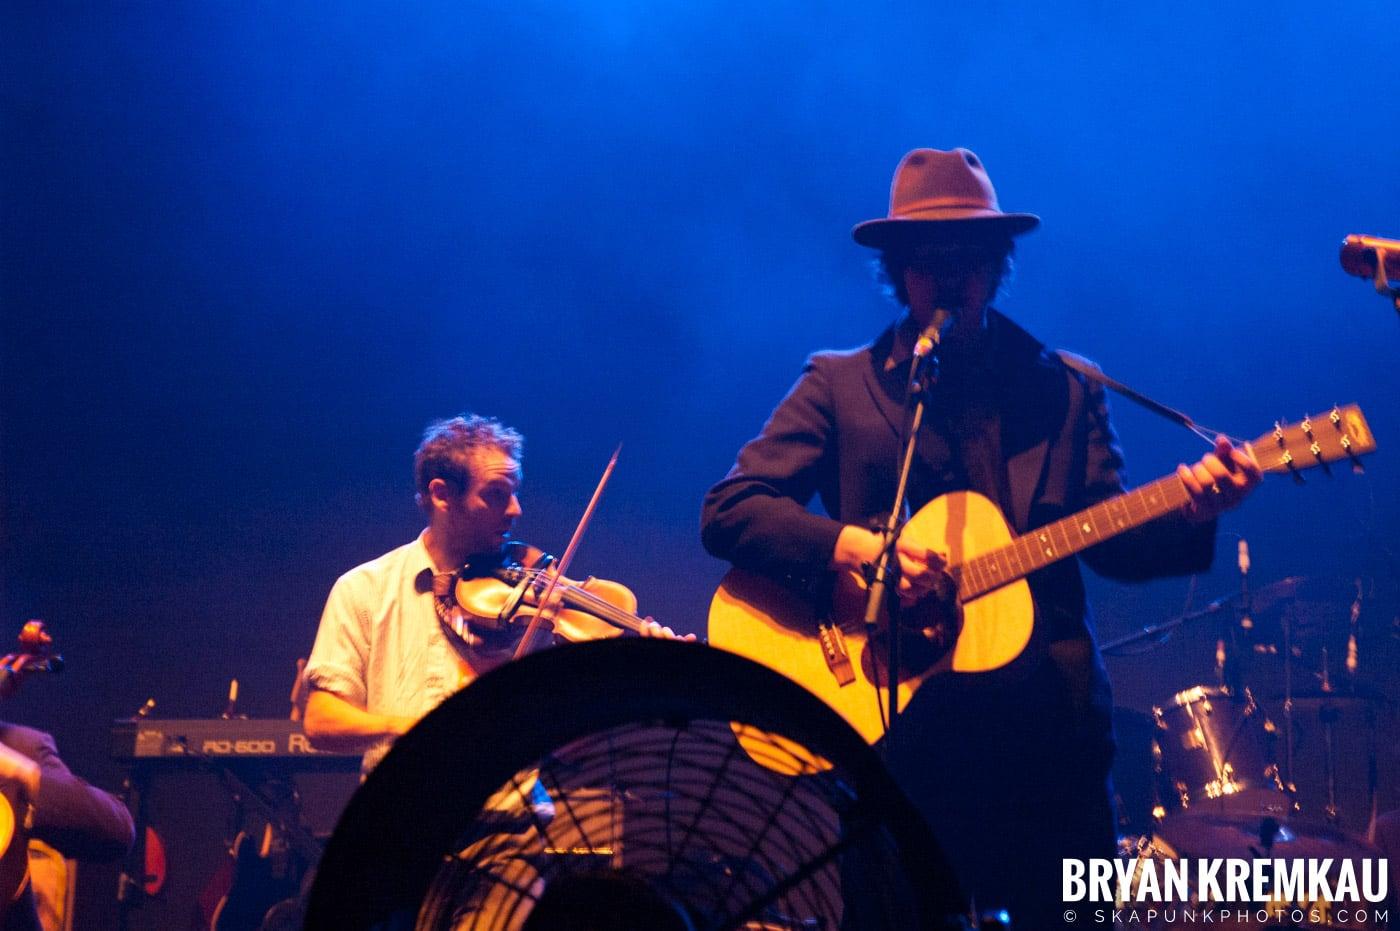 Larrikin Love @ Brixton Academy, London UK - 12.17.06 (7)